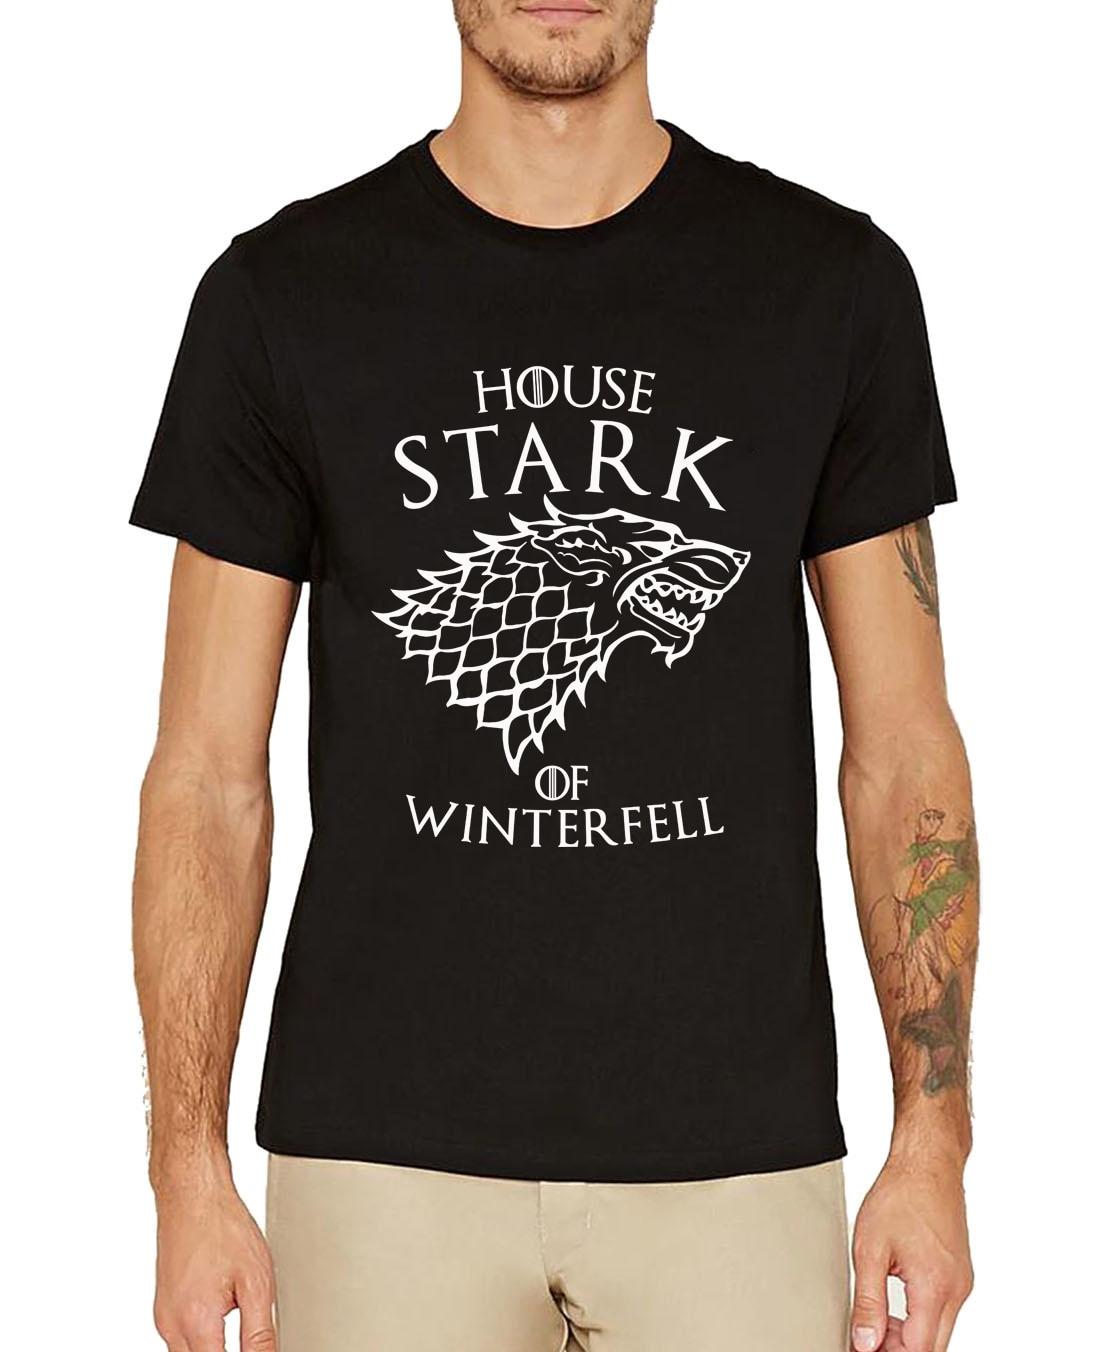 camisetas Game of Thrones men t-shirts house stark of winter fell print 2019 summer short sleeve cotton top tees shirt homme man